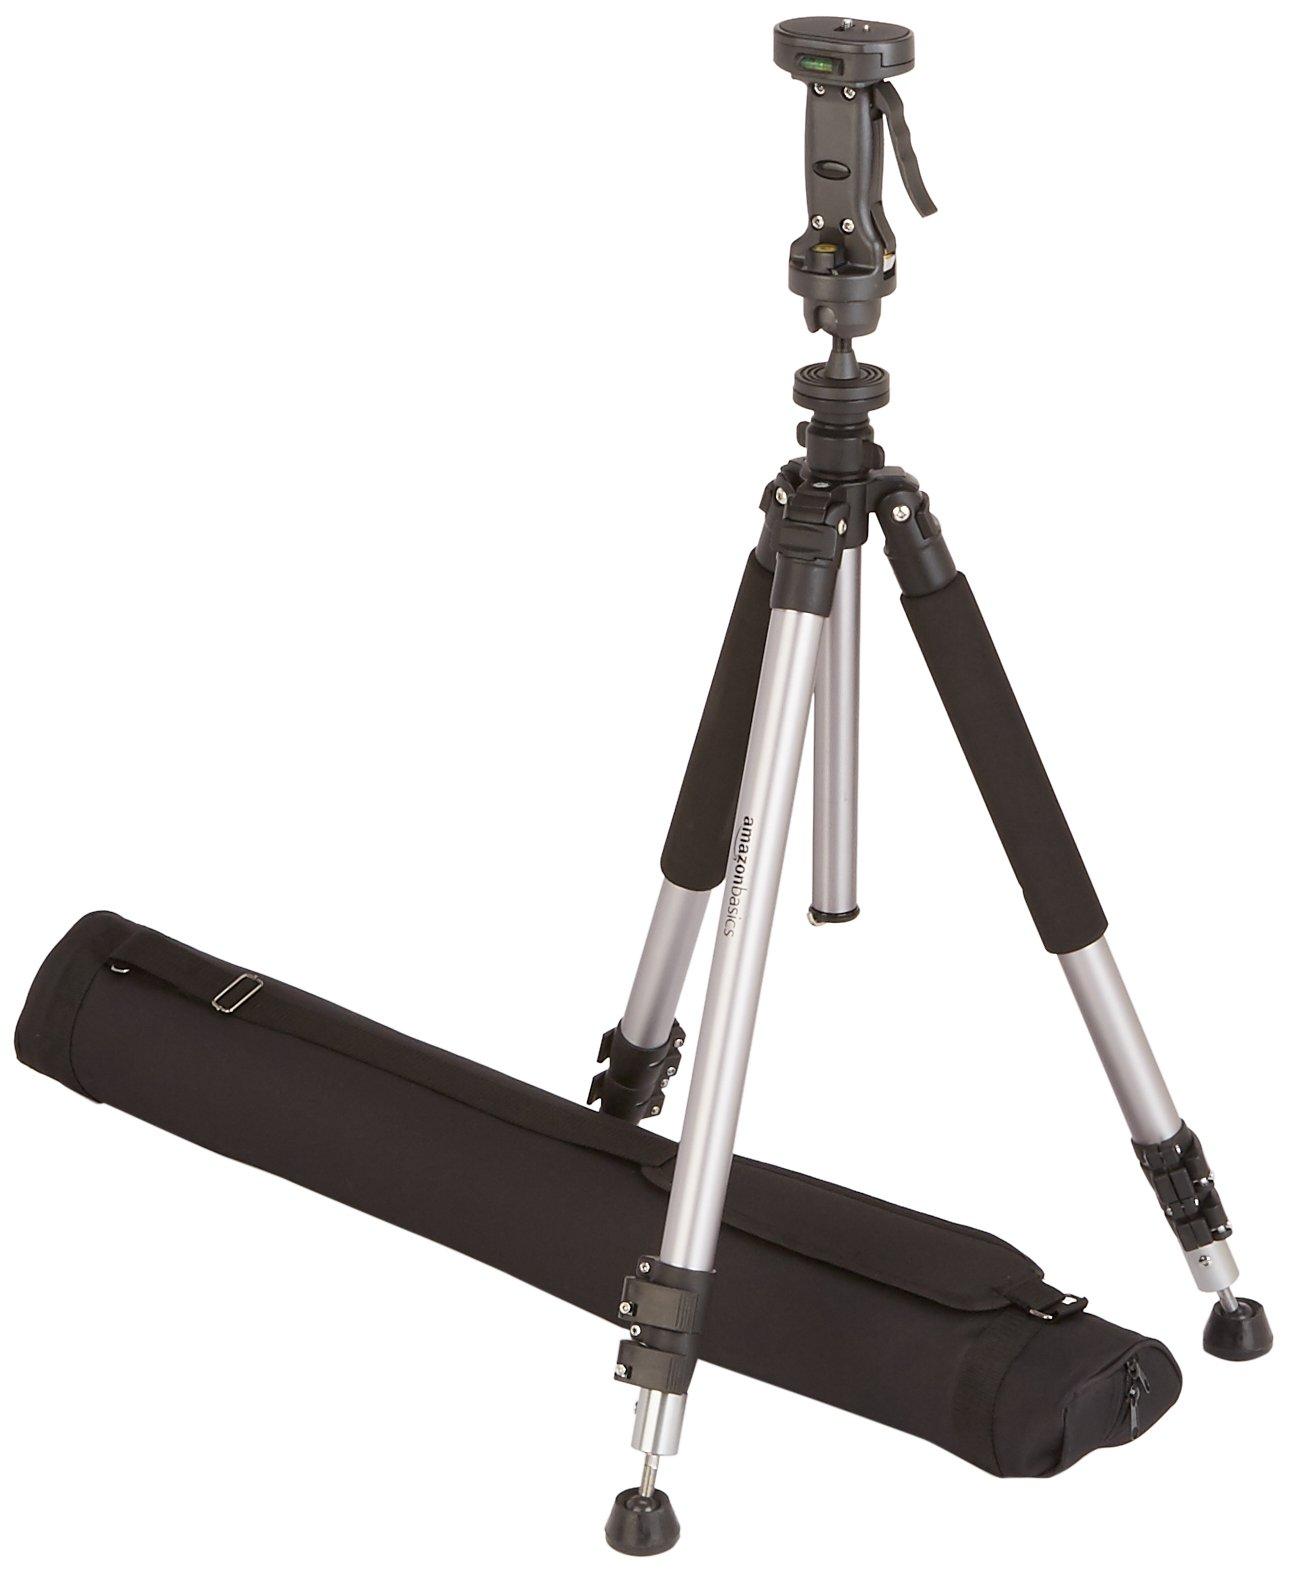 AmazonBasics Pistol Grip Camera Travel Tripod With Bag - 34.4 - 72.6 Inches, Black by AmazonBasics